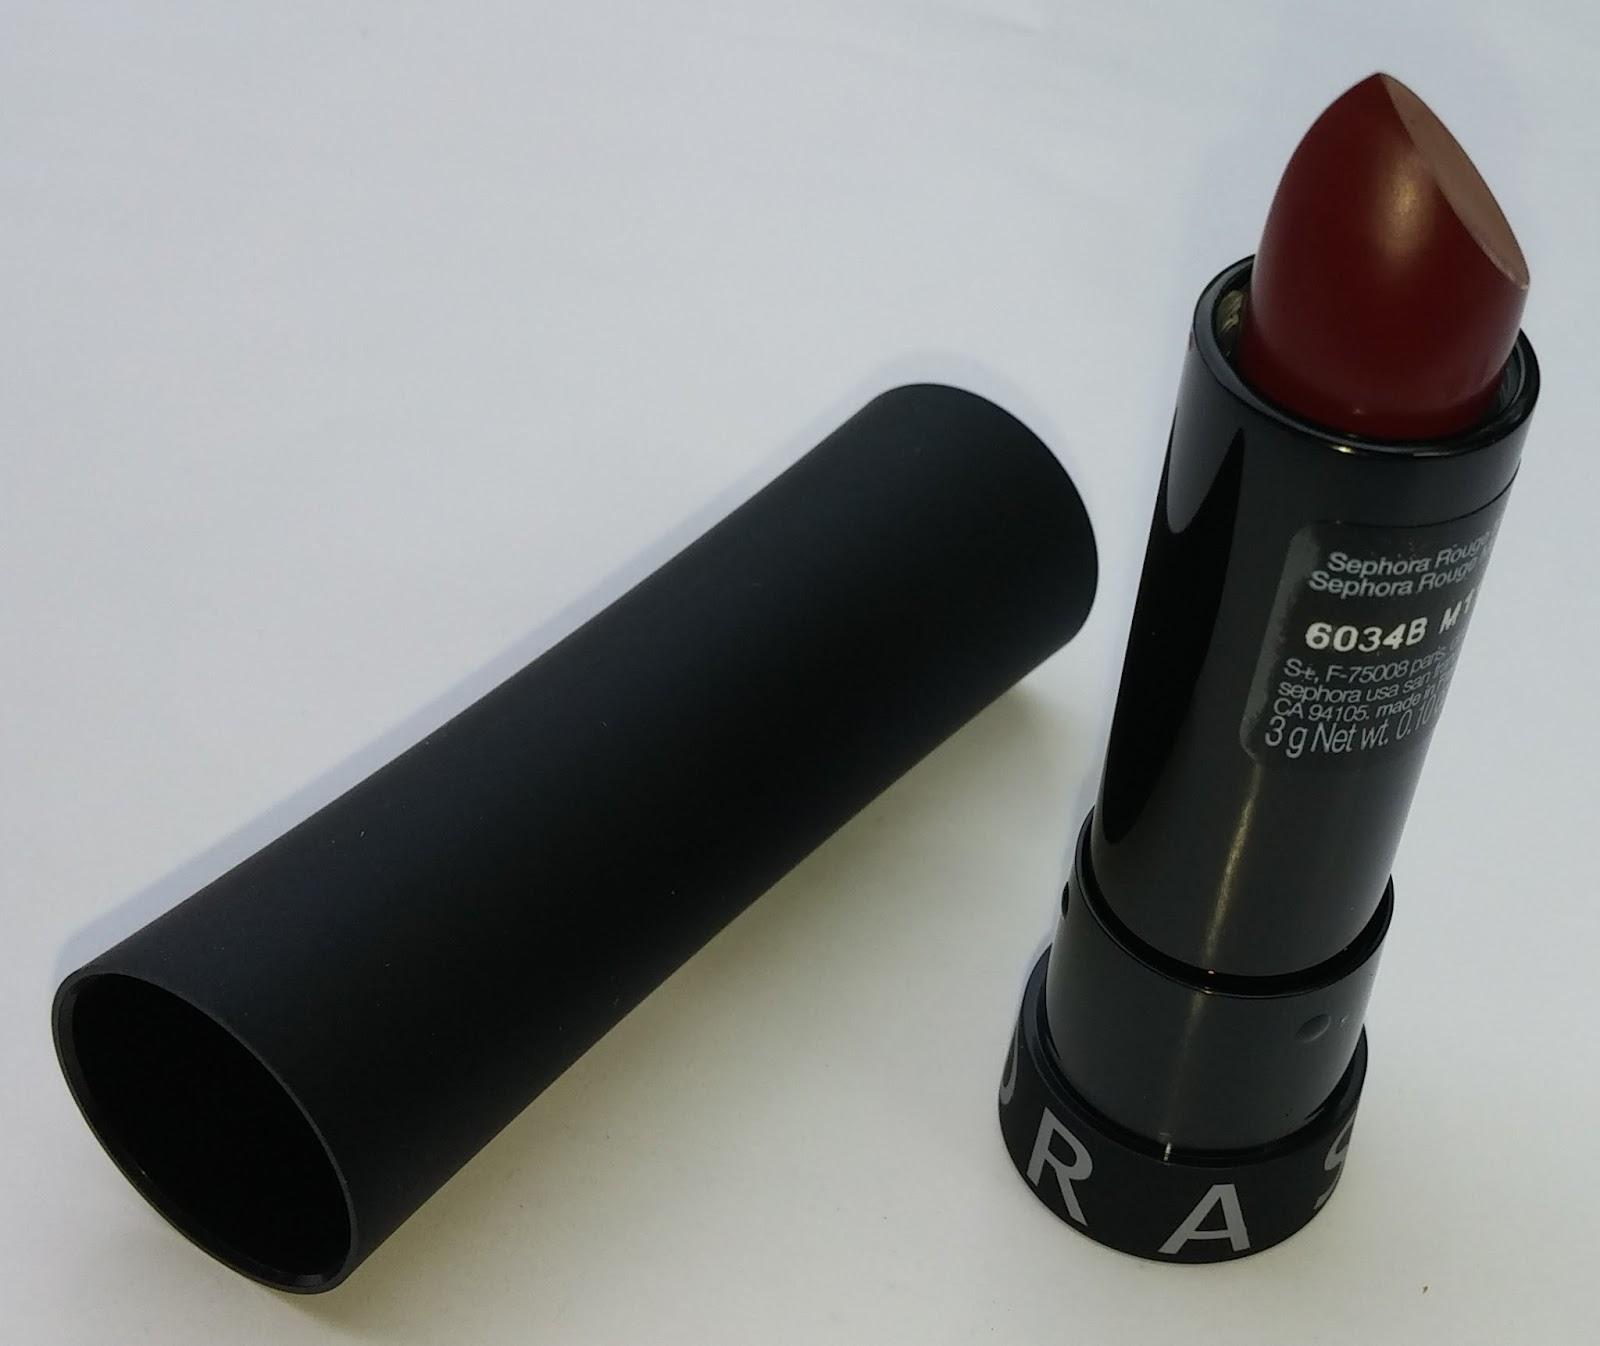 Sparkled Beauty: Sephora Rouge shine/ matte/ balm